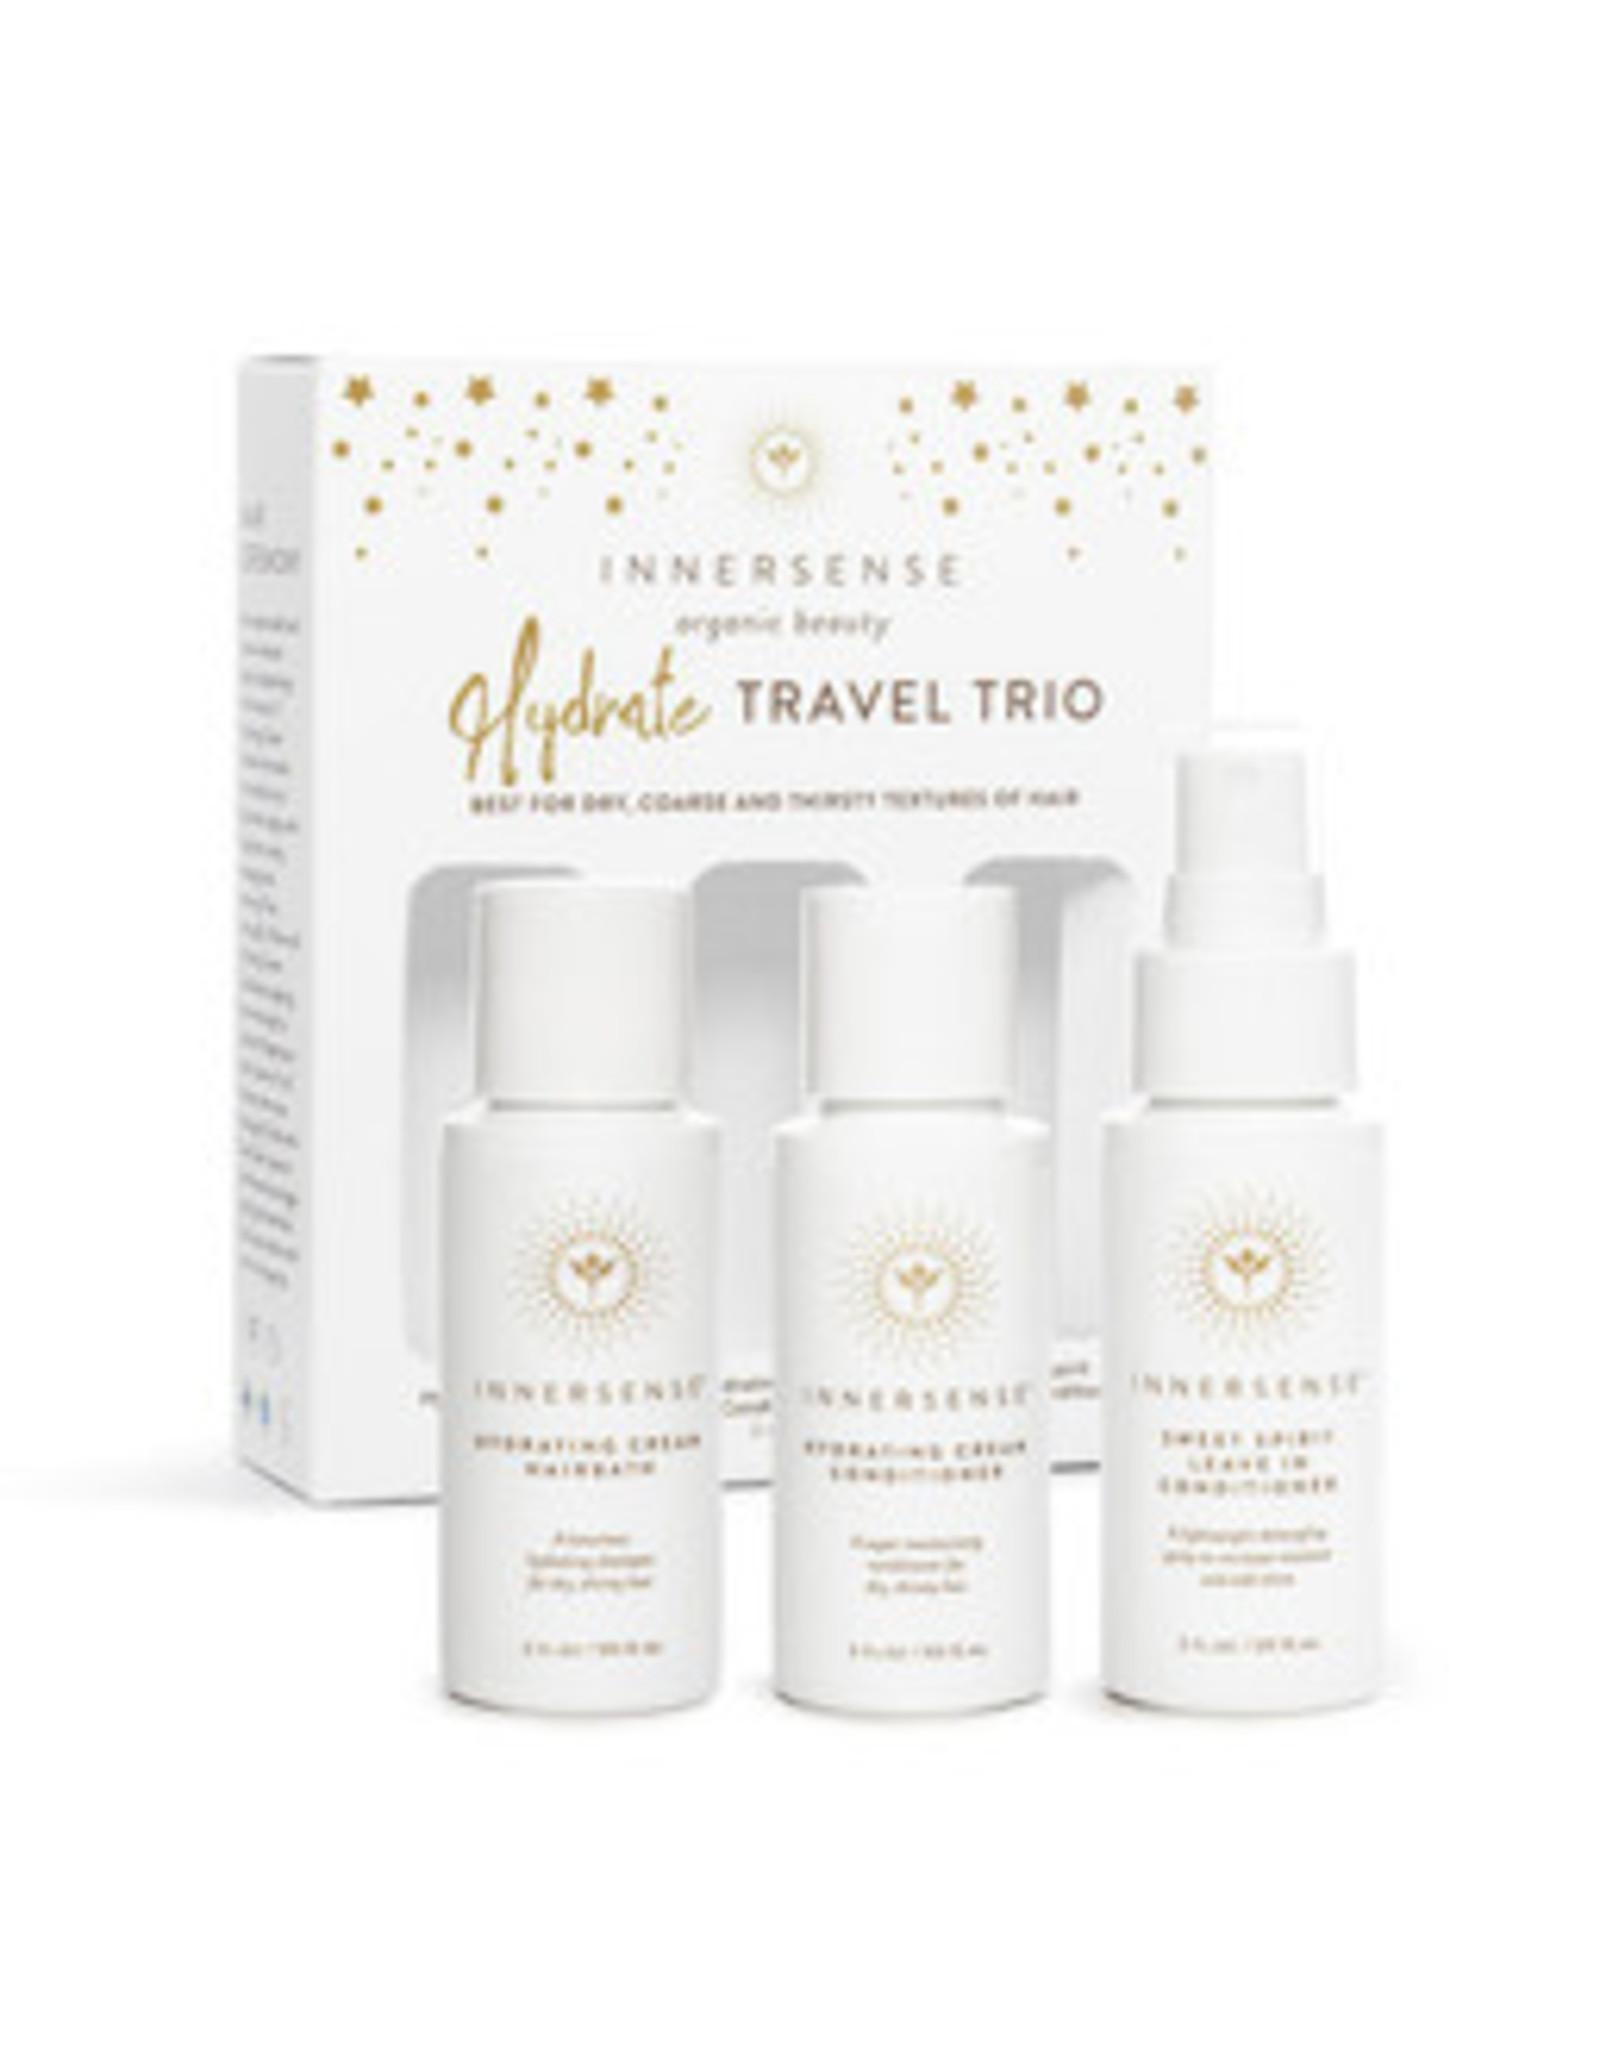 Innersense Hydrate Travel Trio